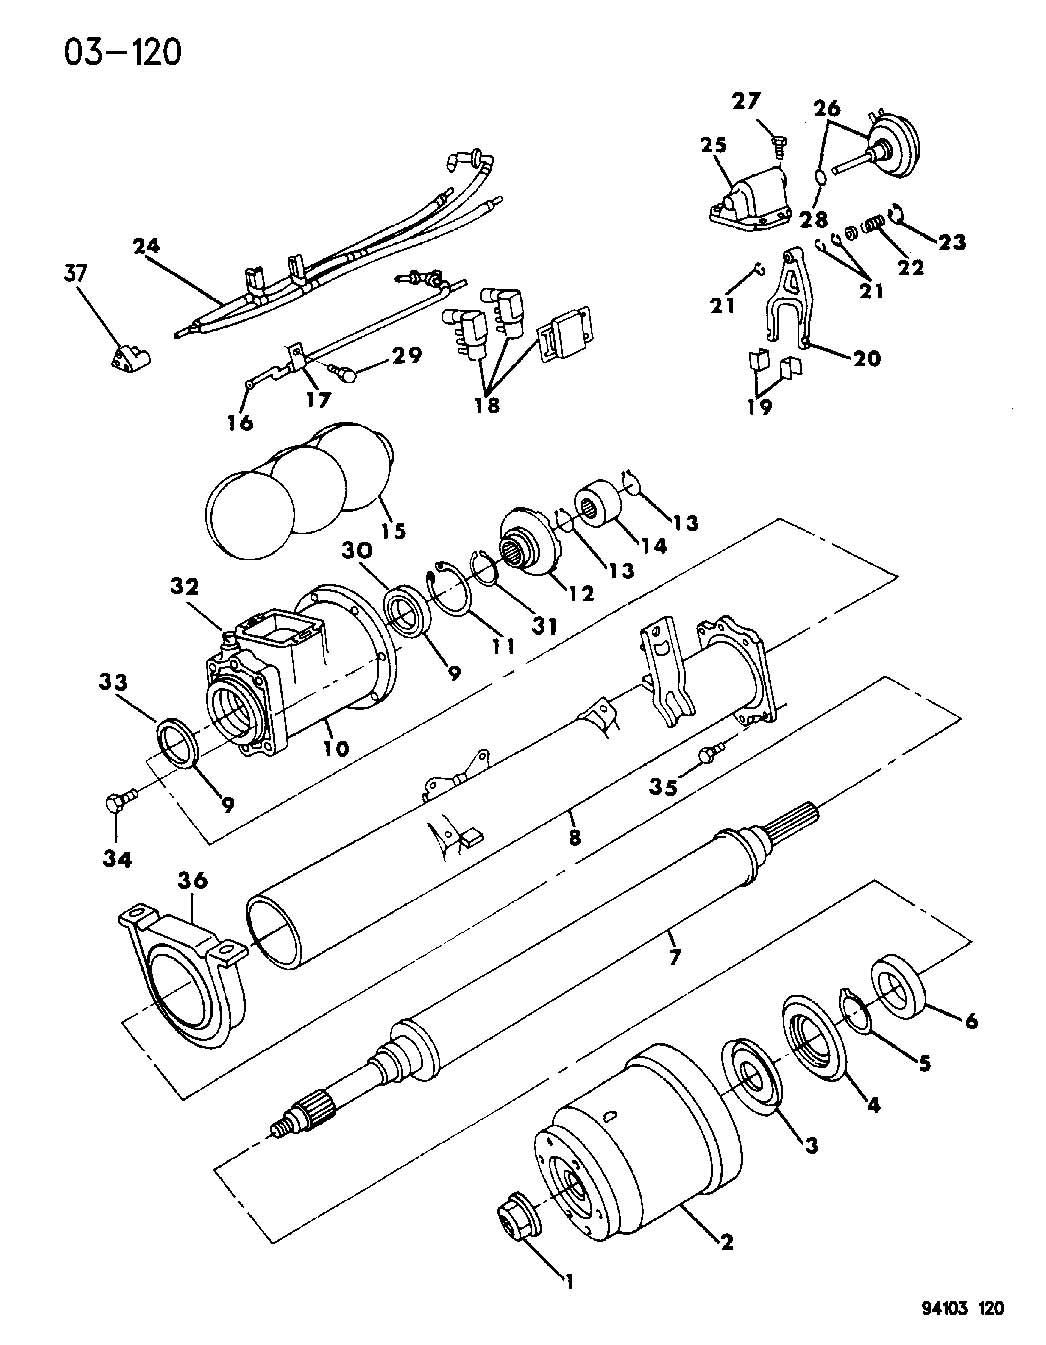 dodge caravan tail light wiring diagram images dodge journey tail light wiring harness wiring